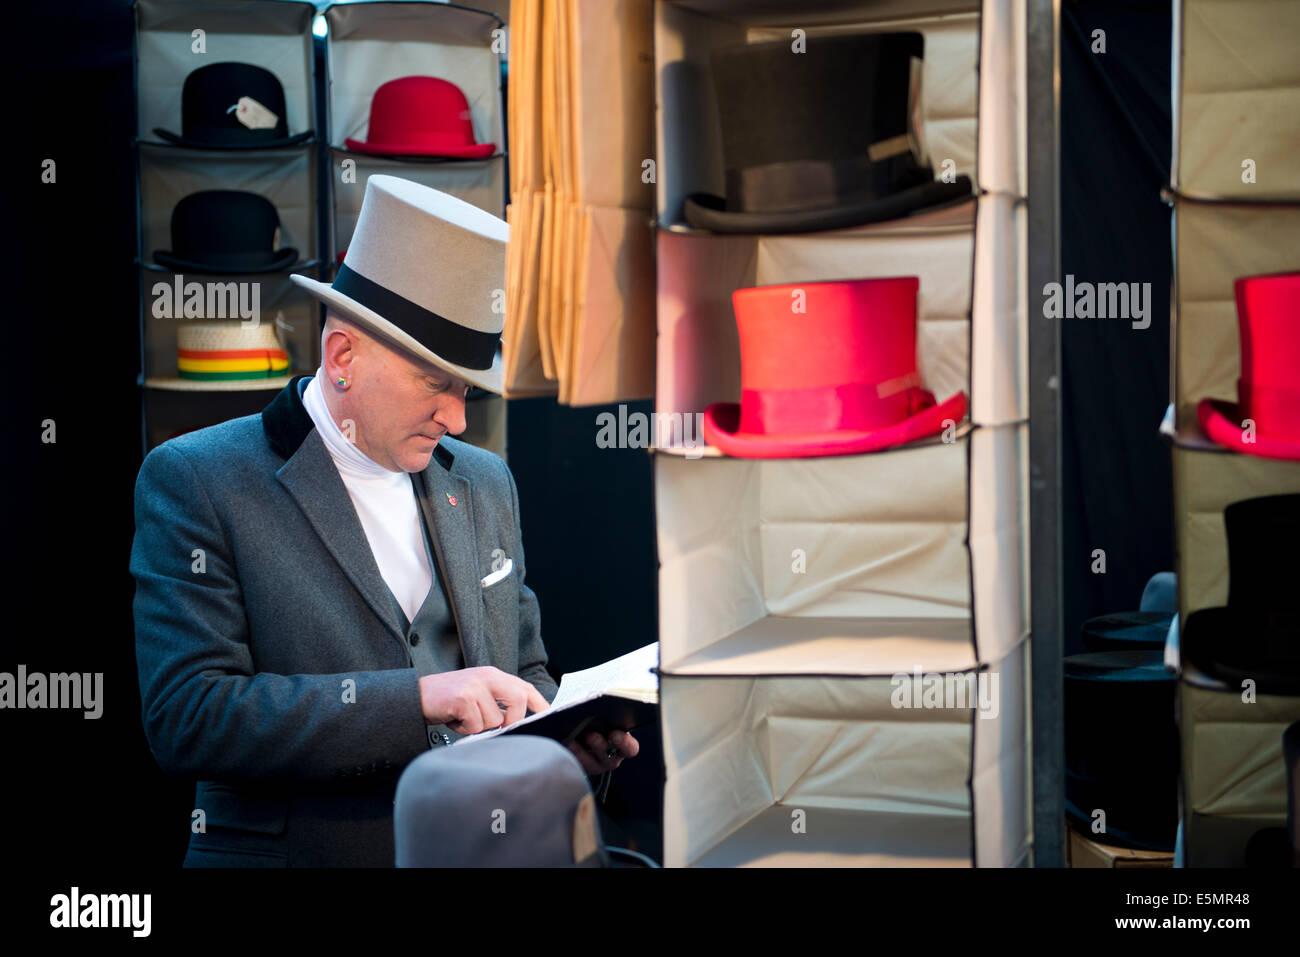 Smart stall holder selling Top Hats, Spitalfields market. East London, UK 2014 - Stock Image